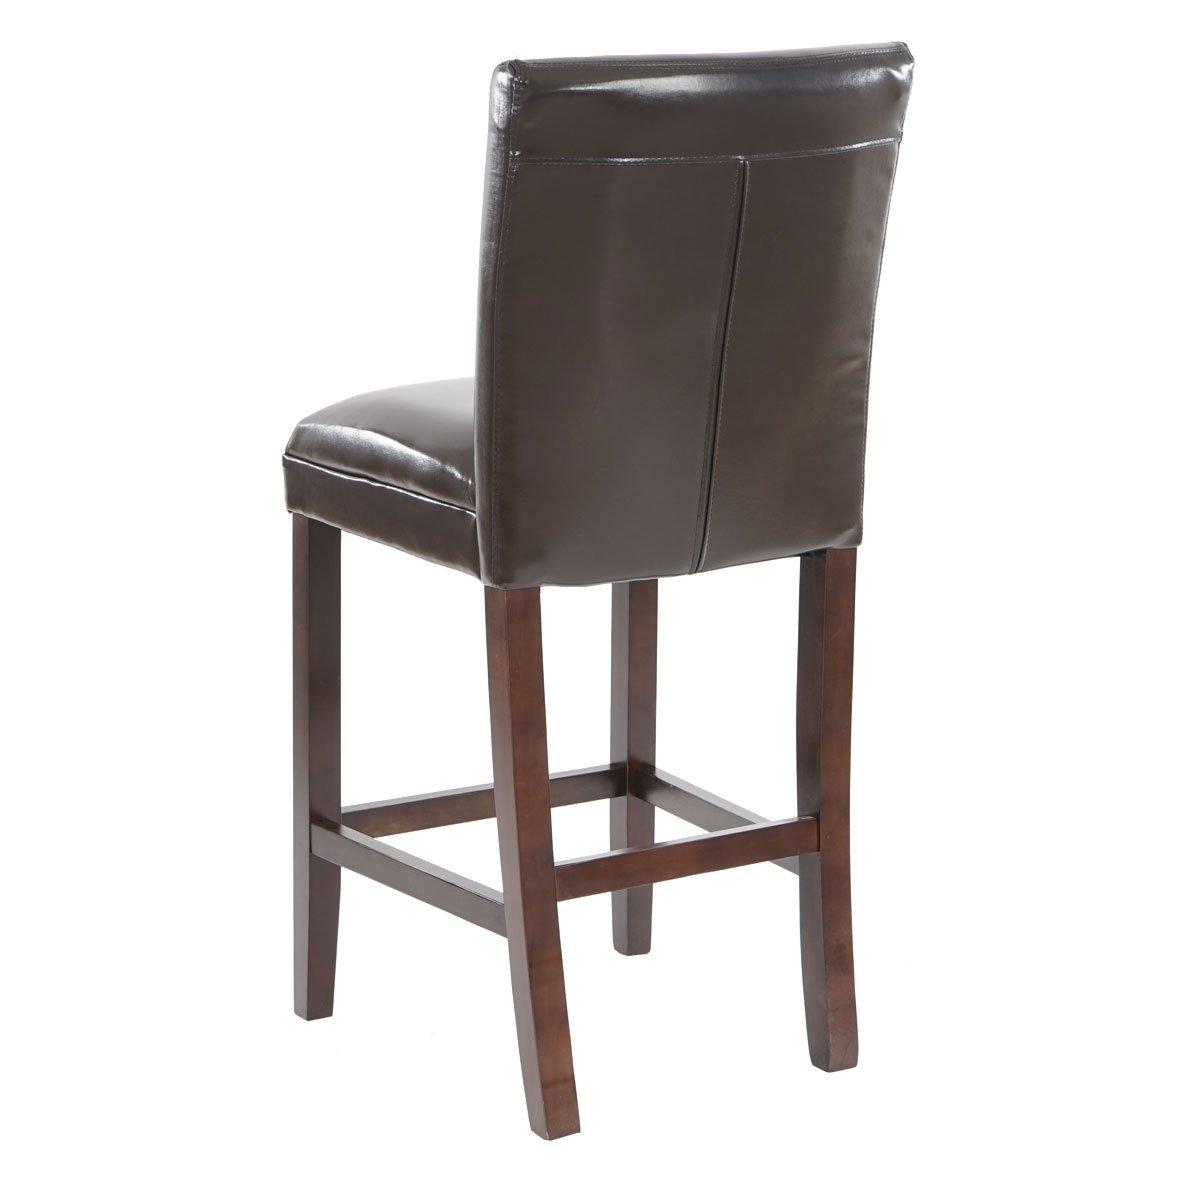 Lote 2 taburetes para personas obseas austin hasta 150kg lote 2 taburetes de bar xxl austin - Taburetes bar ...